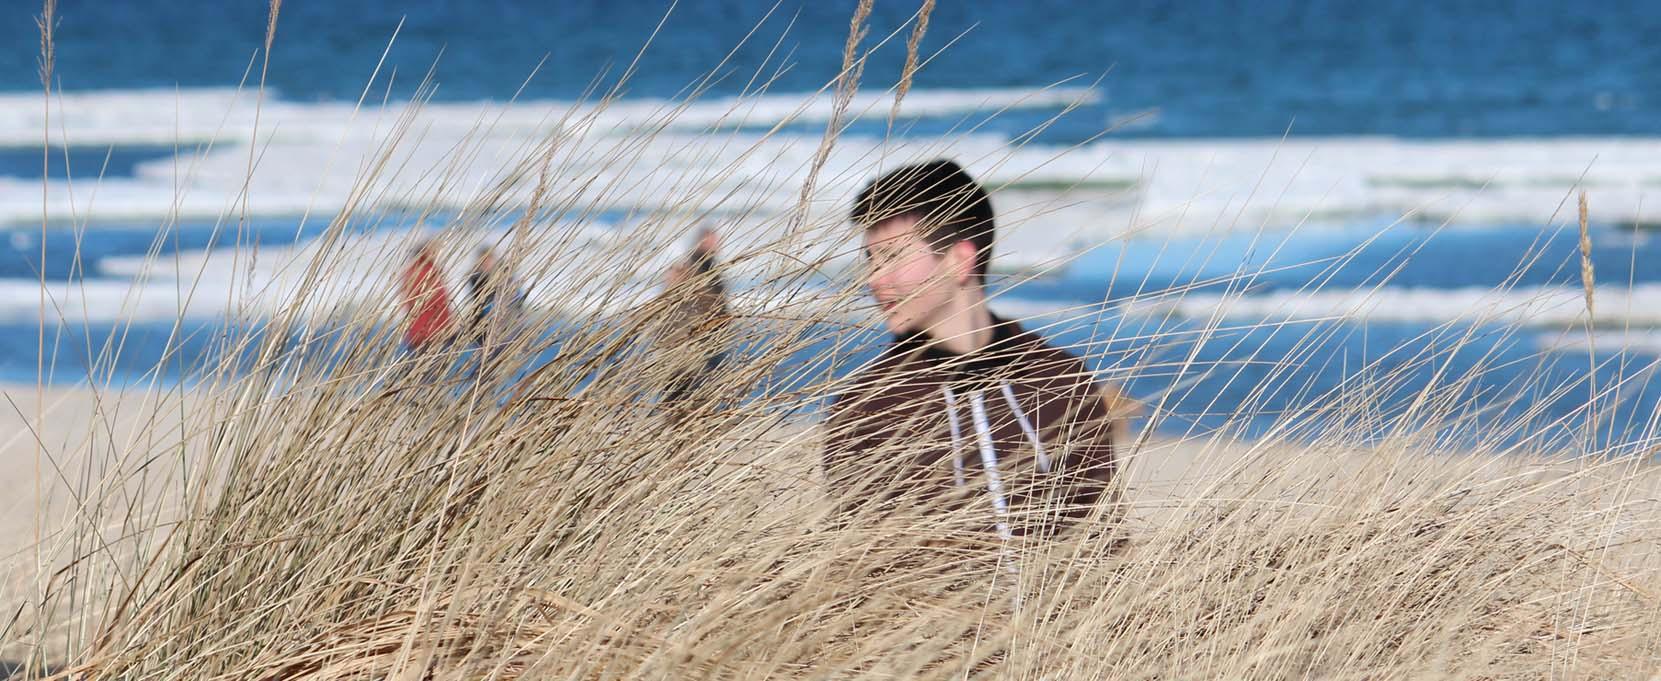 Strandaussichten